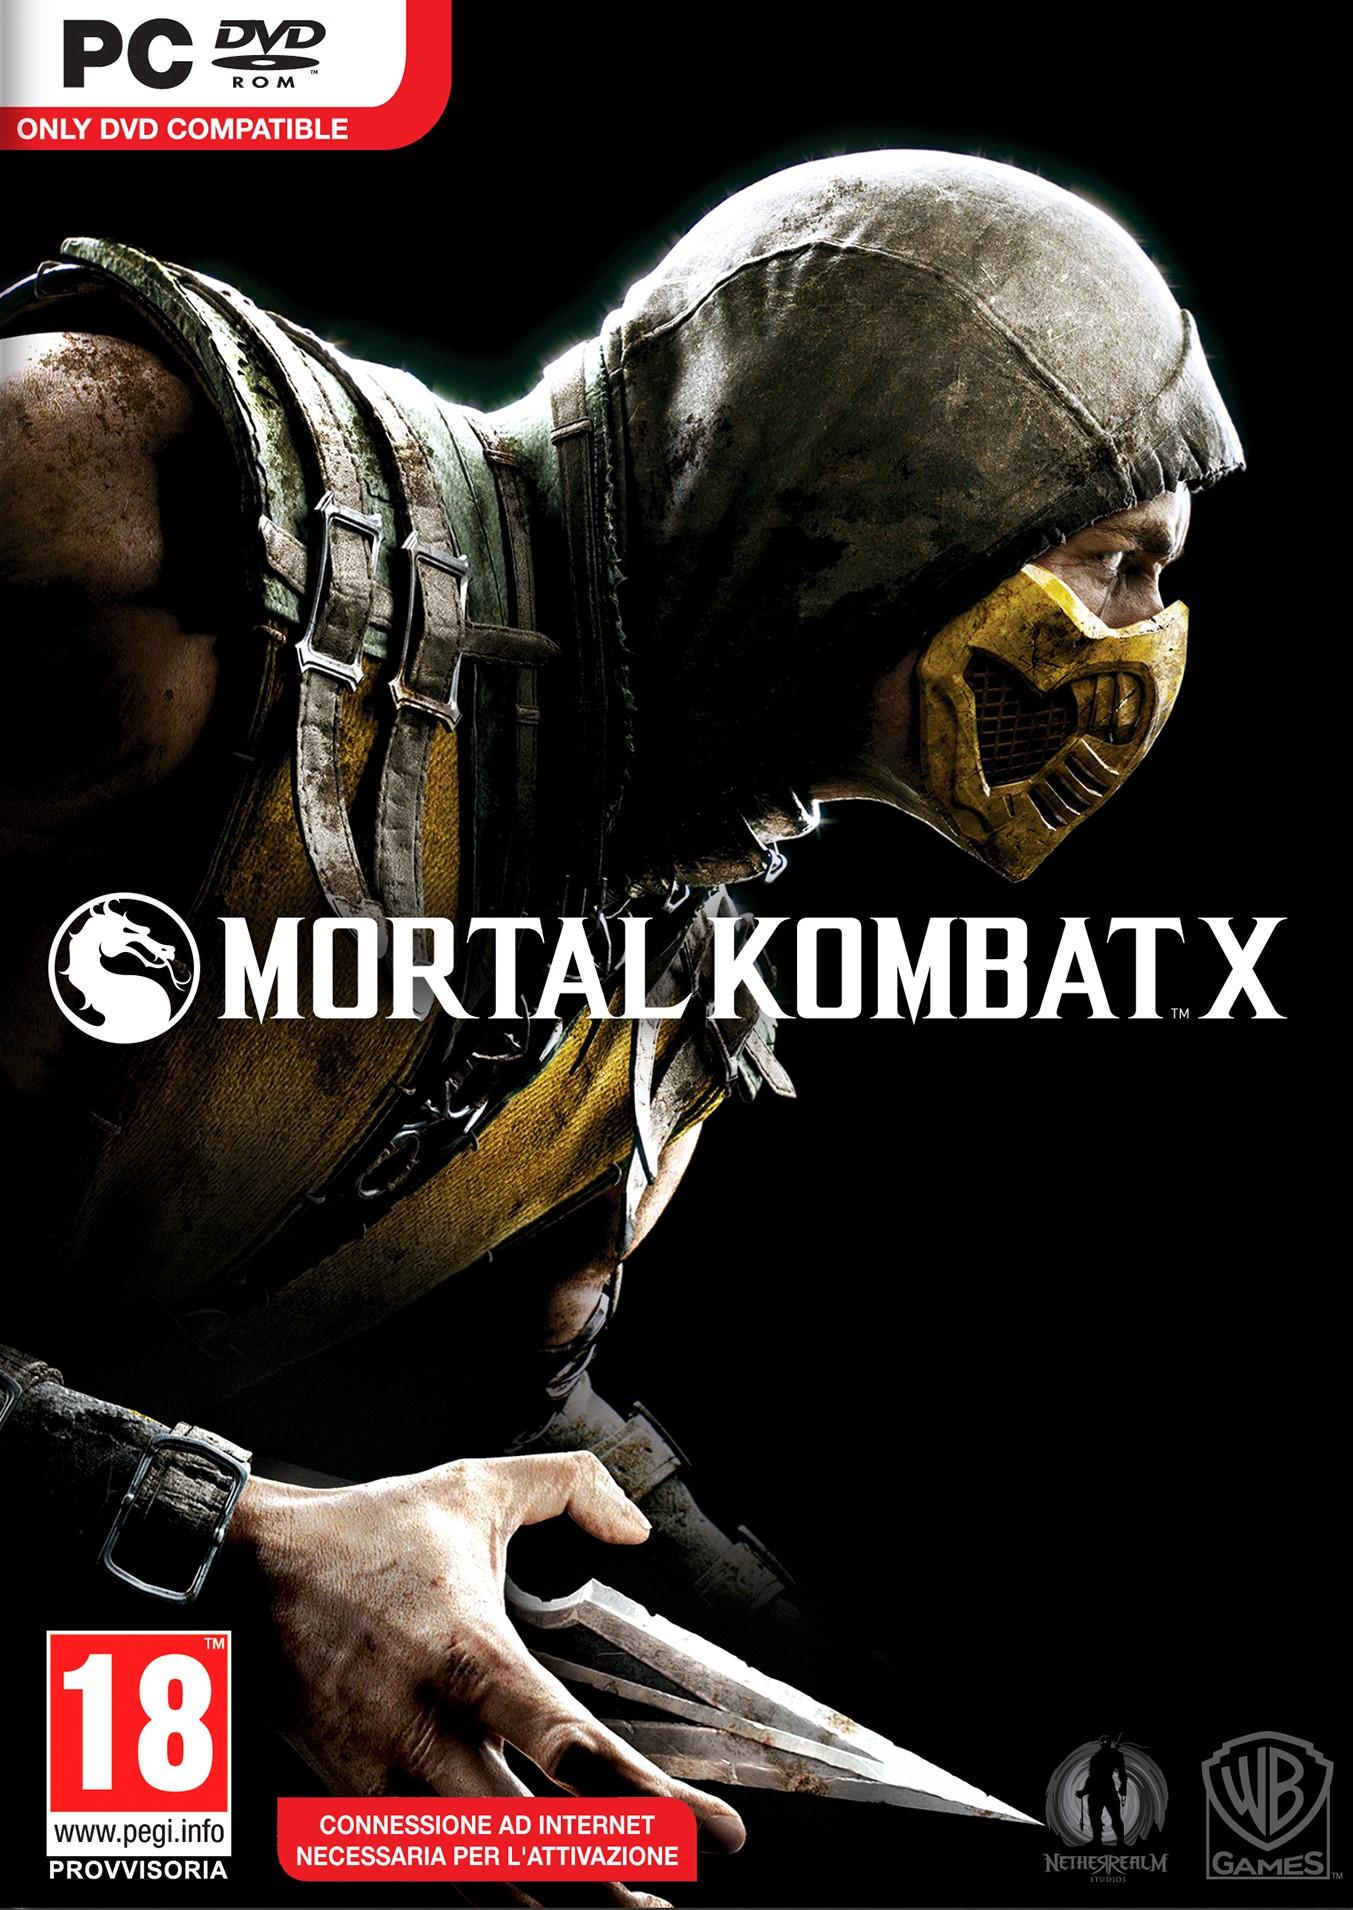 PC Mortal Kombat X Nové